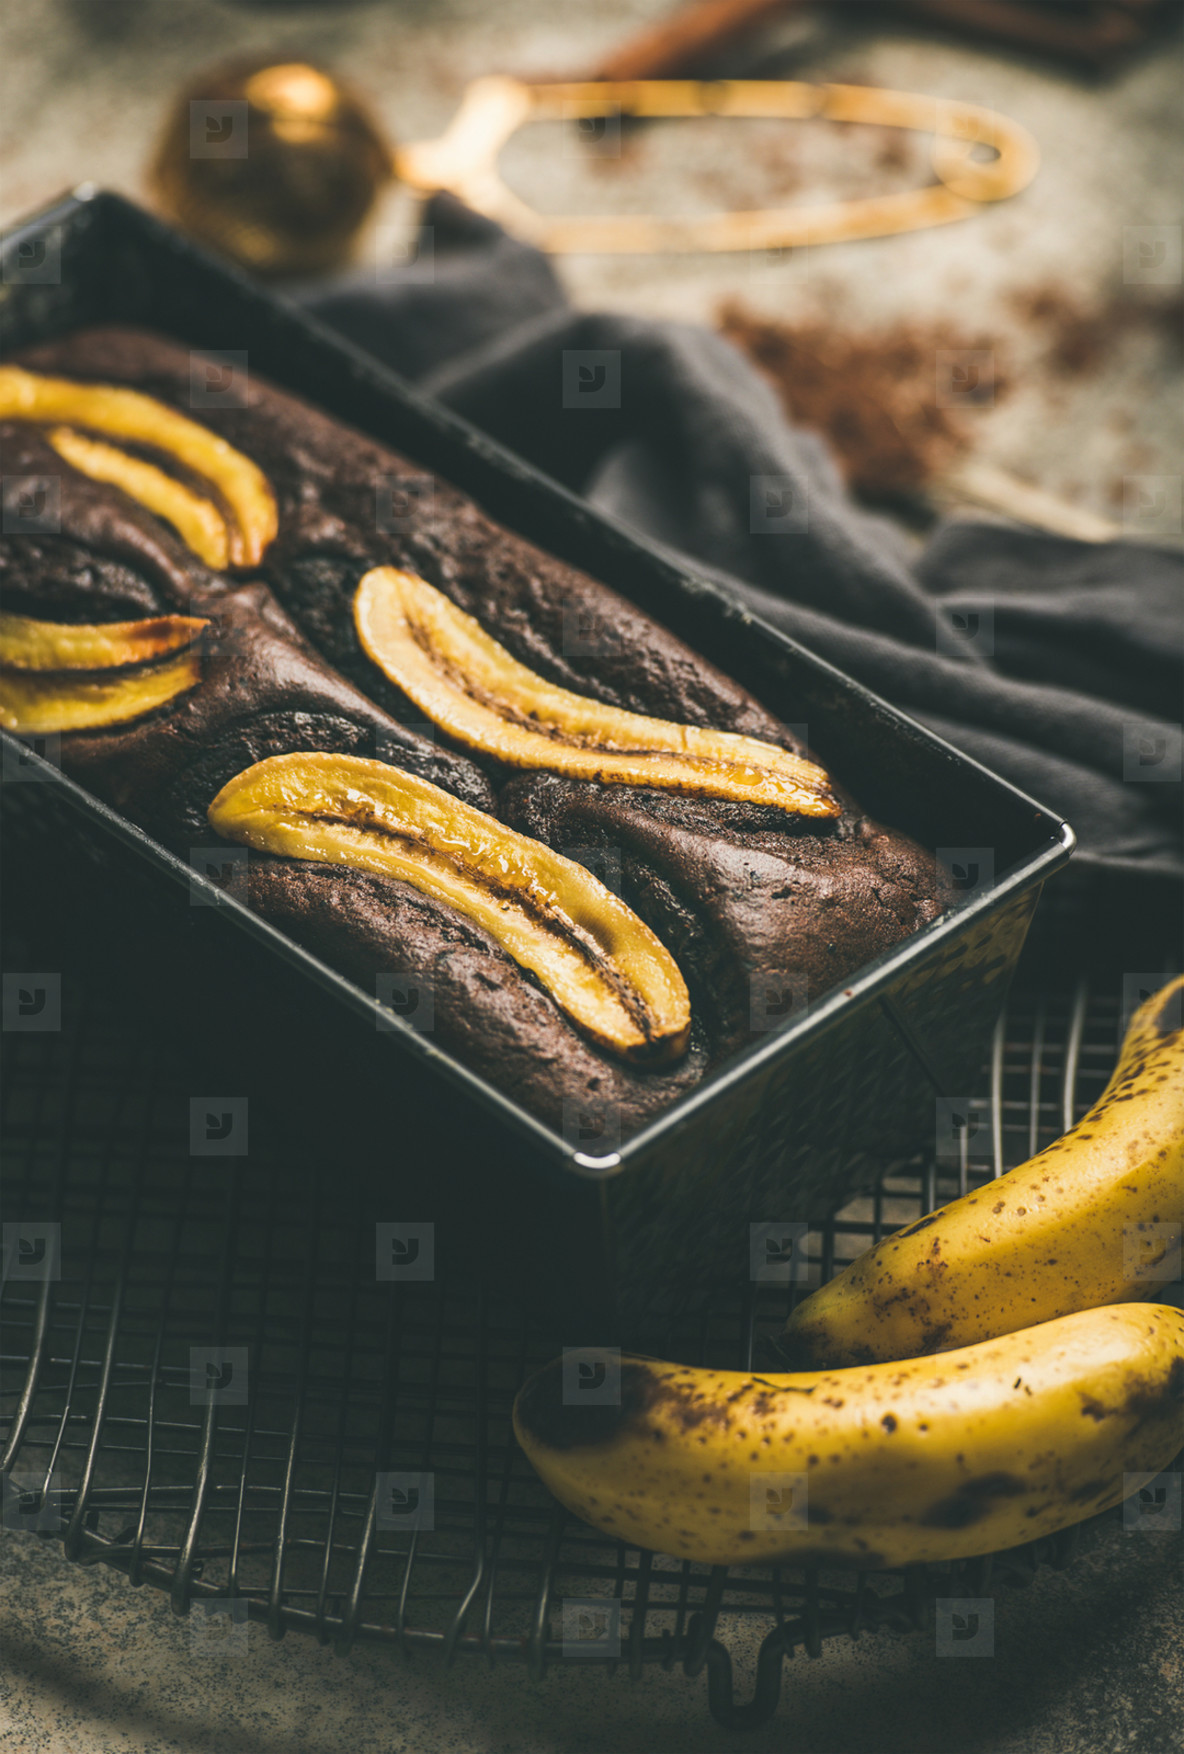 Freshly baked chocolate banana cake with cinnamon in baking tin